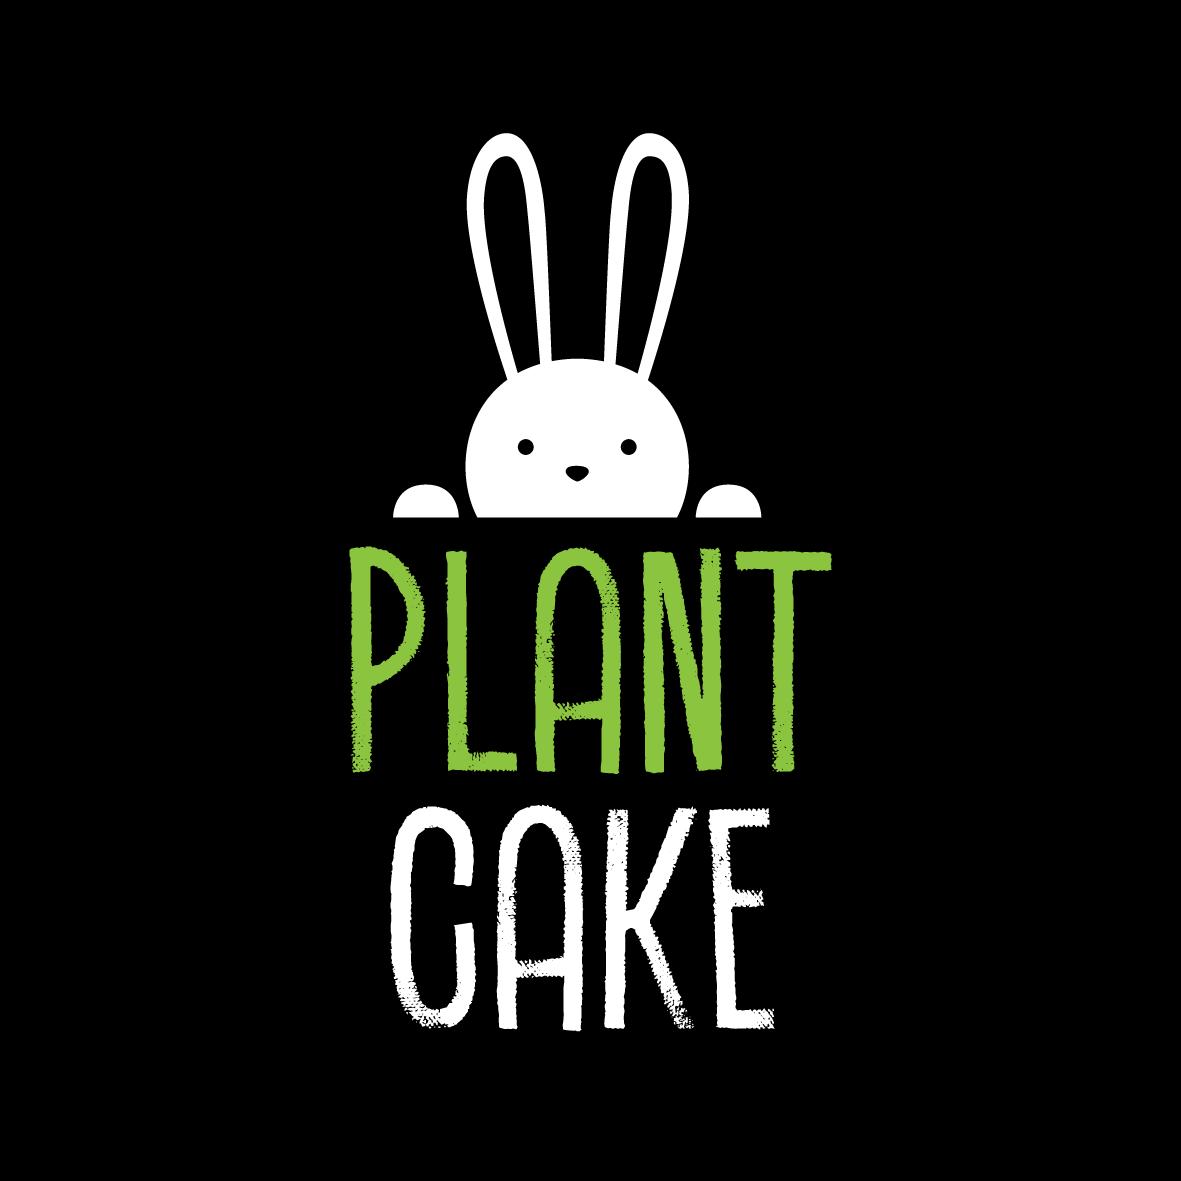 PlantCake